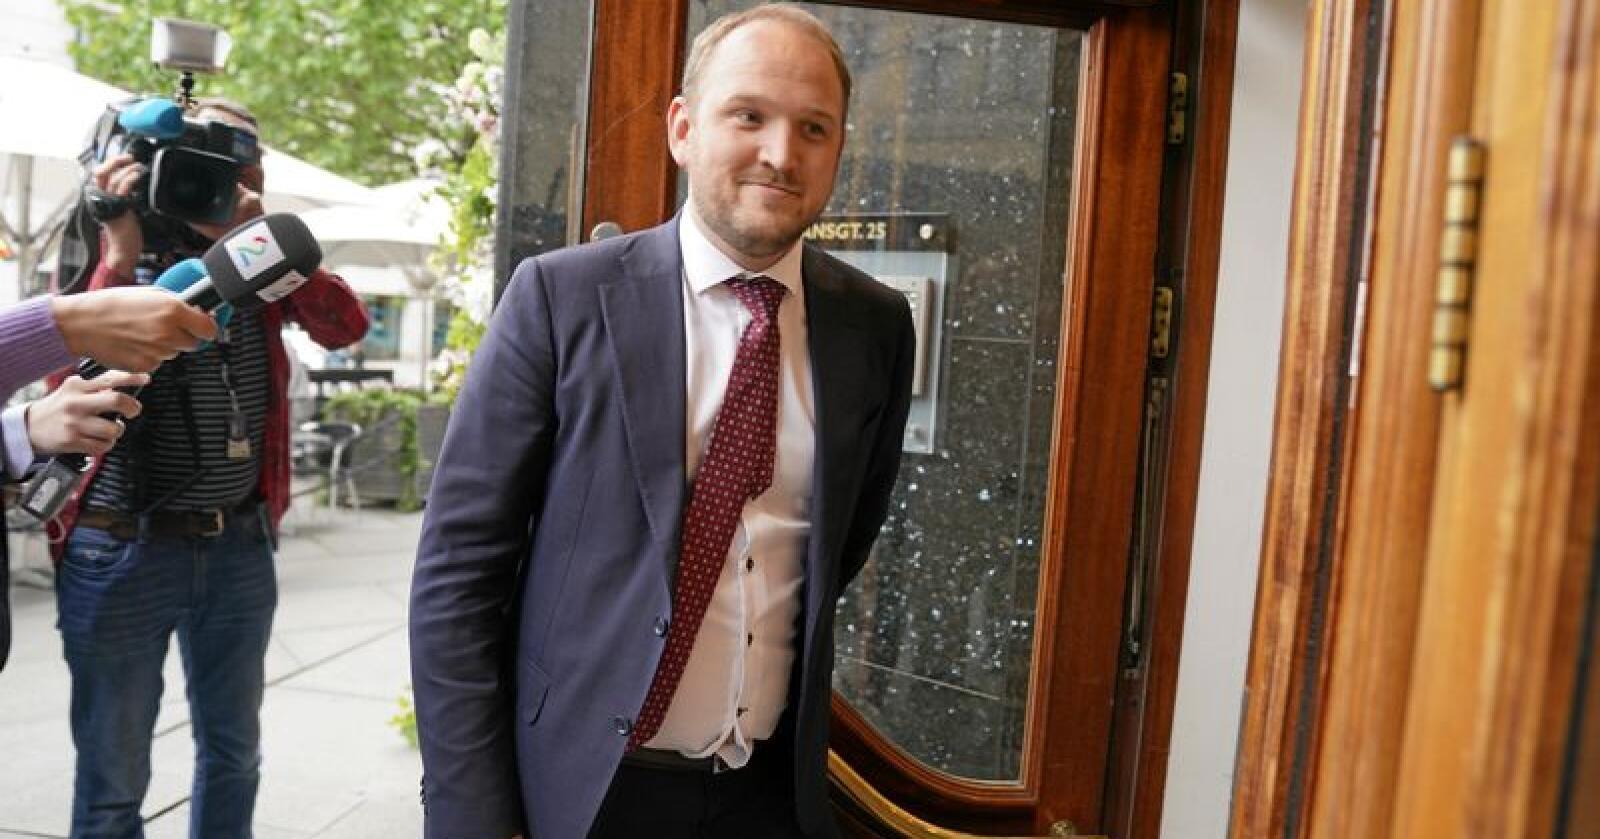 Norske bilistar skal ikkje vere mjølkekyr, skriv samferdsleminister Jon Georg Dale. Foto: Heiko Junge / NTB scanpix